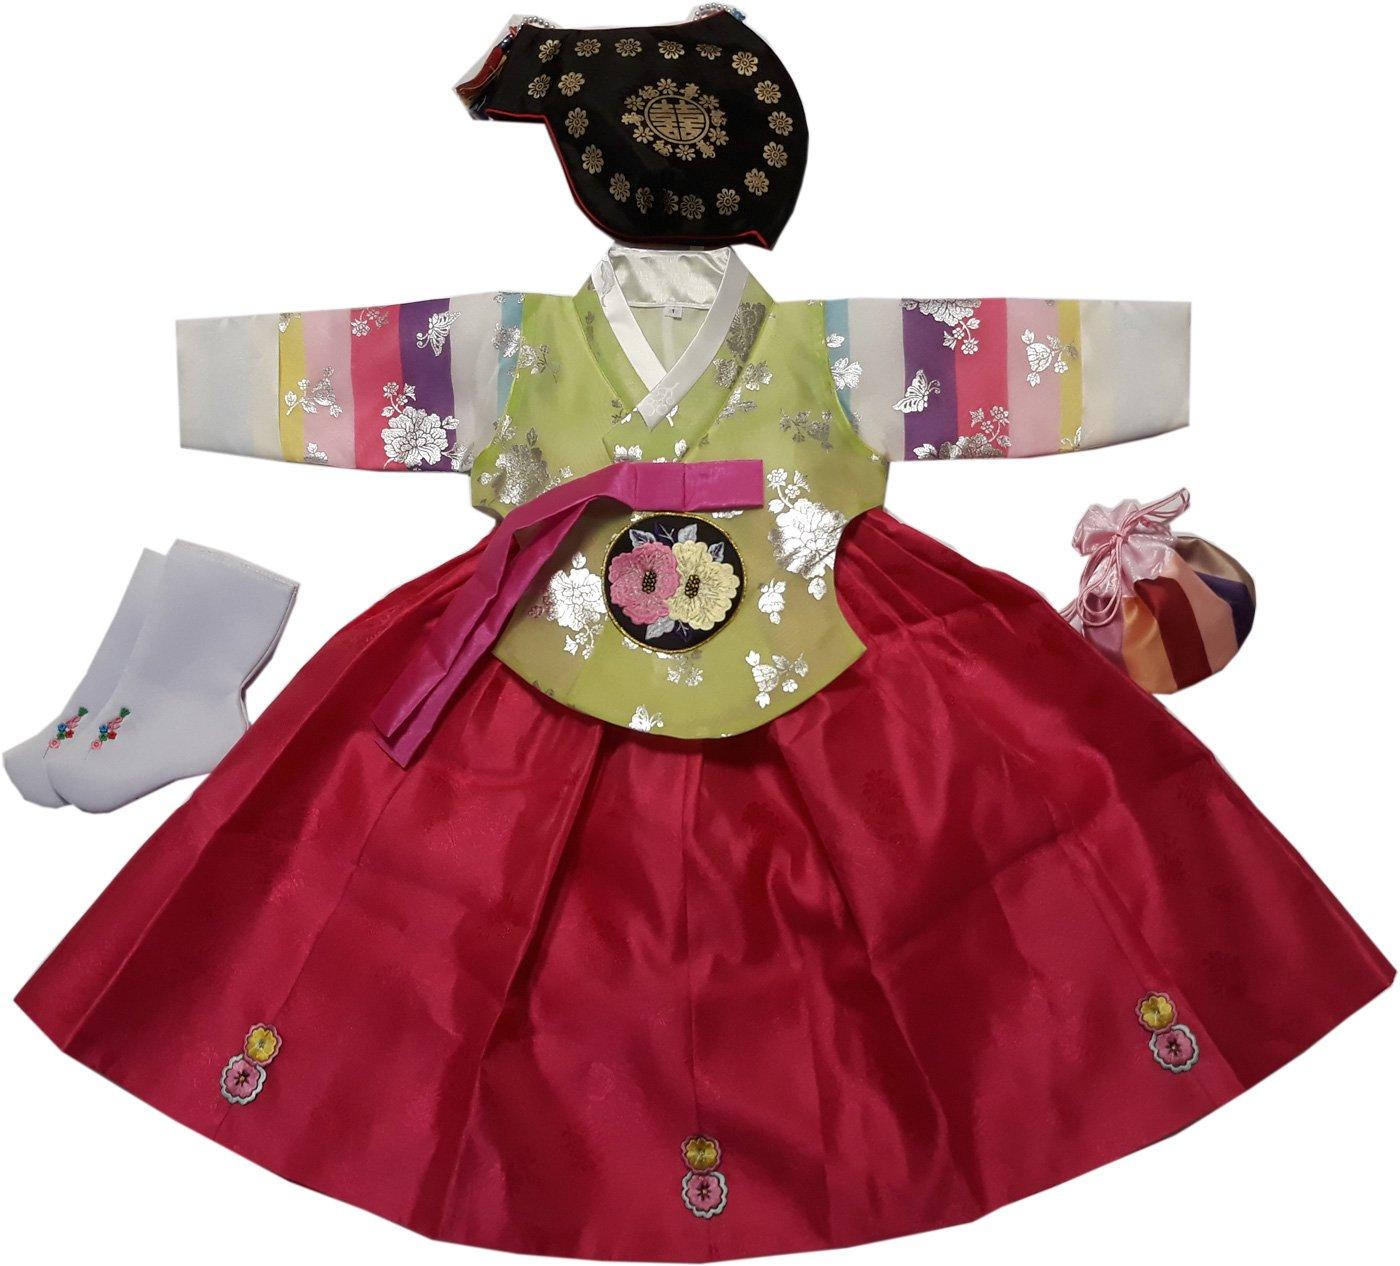 Hanbok Korean Traditional Girls Costumes Dress 1st Birthday DOLBOK hg1001/1f